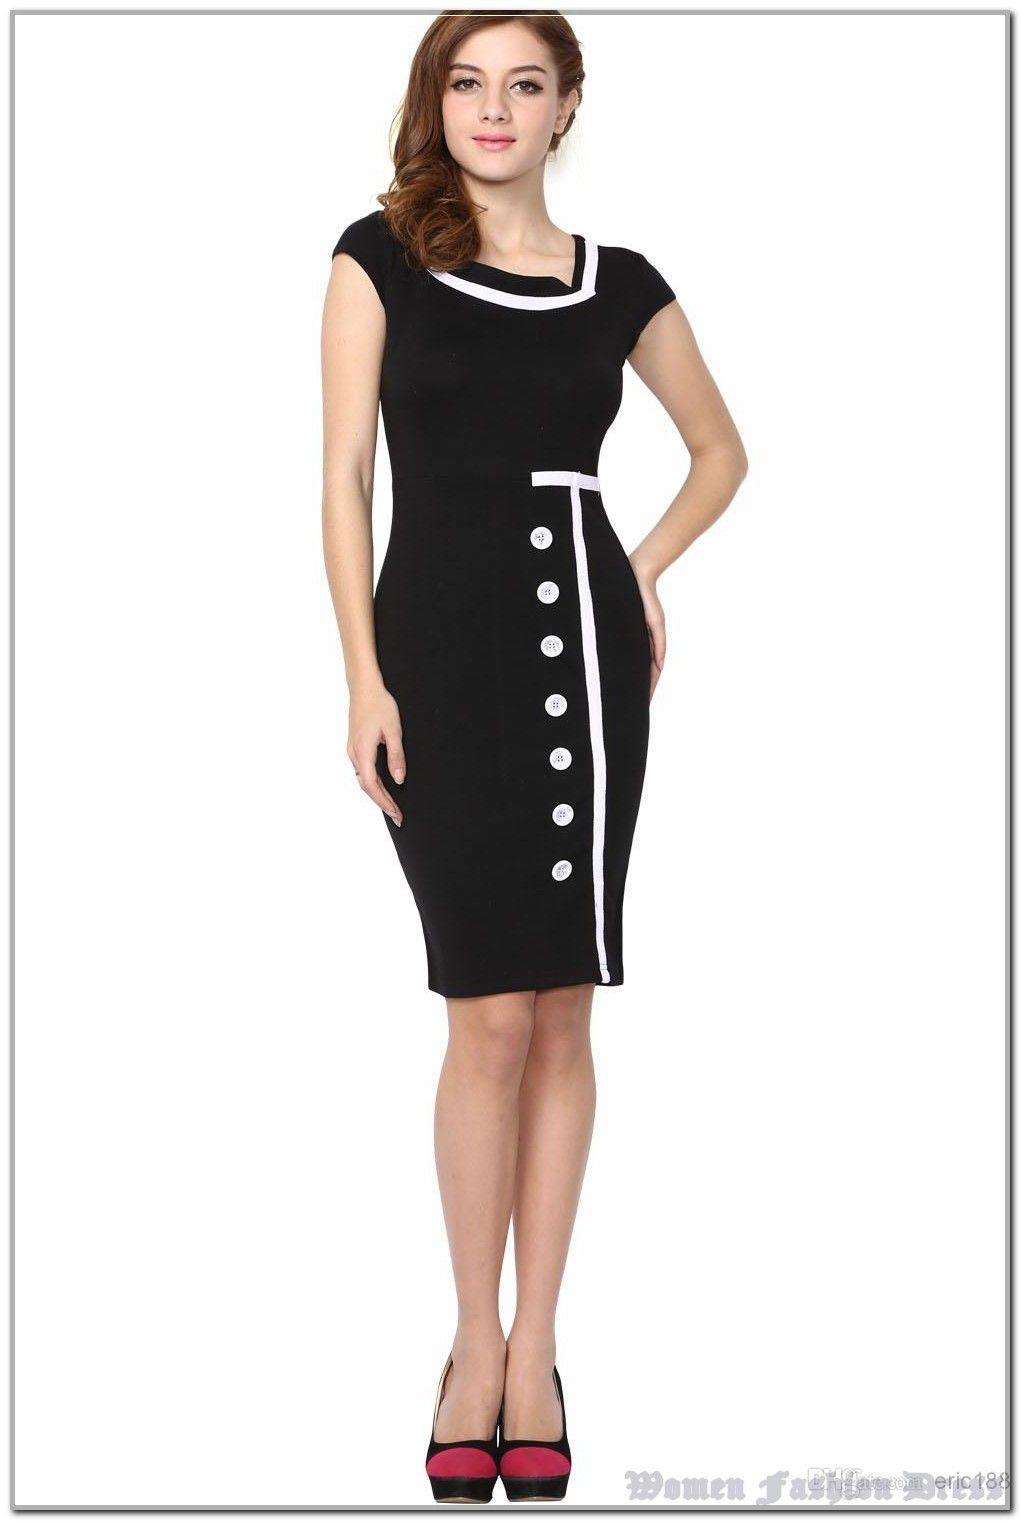 3 Guilt Free Women Fashion Dress Tips